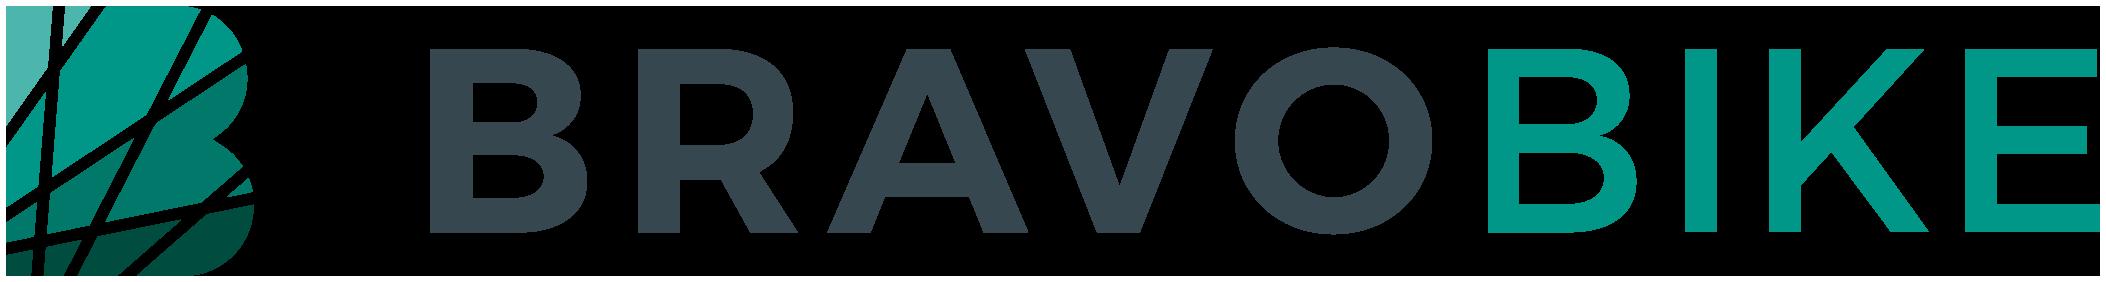 bravobike GmbH_logo